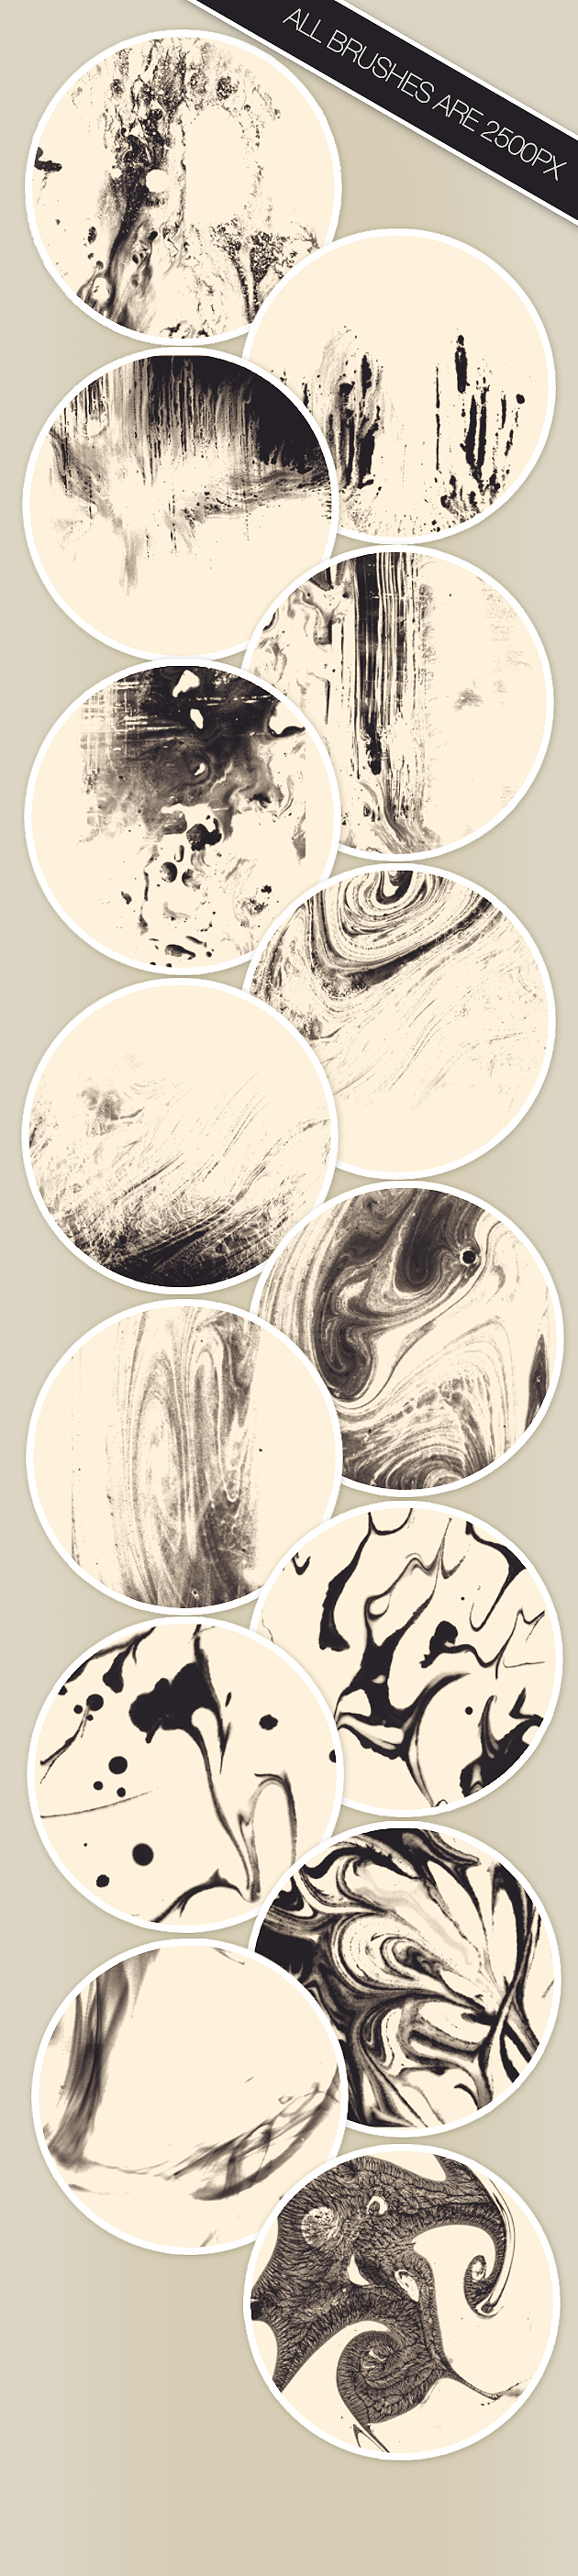 Liquid-Photoshop-Brushes-Set-1 designtnt brushes liquid large